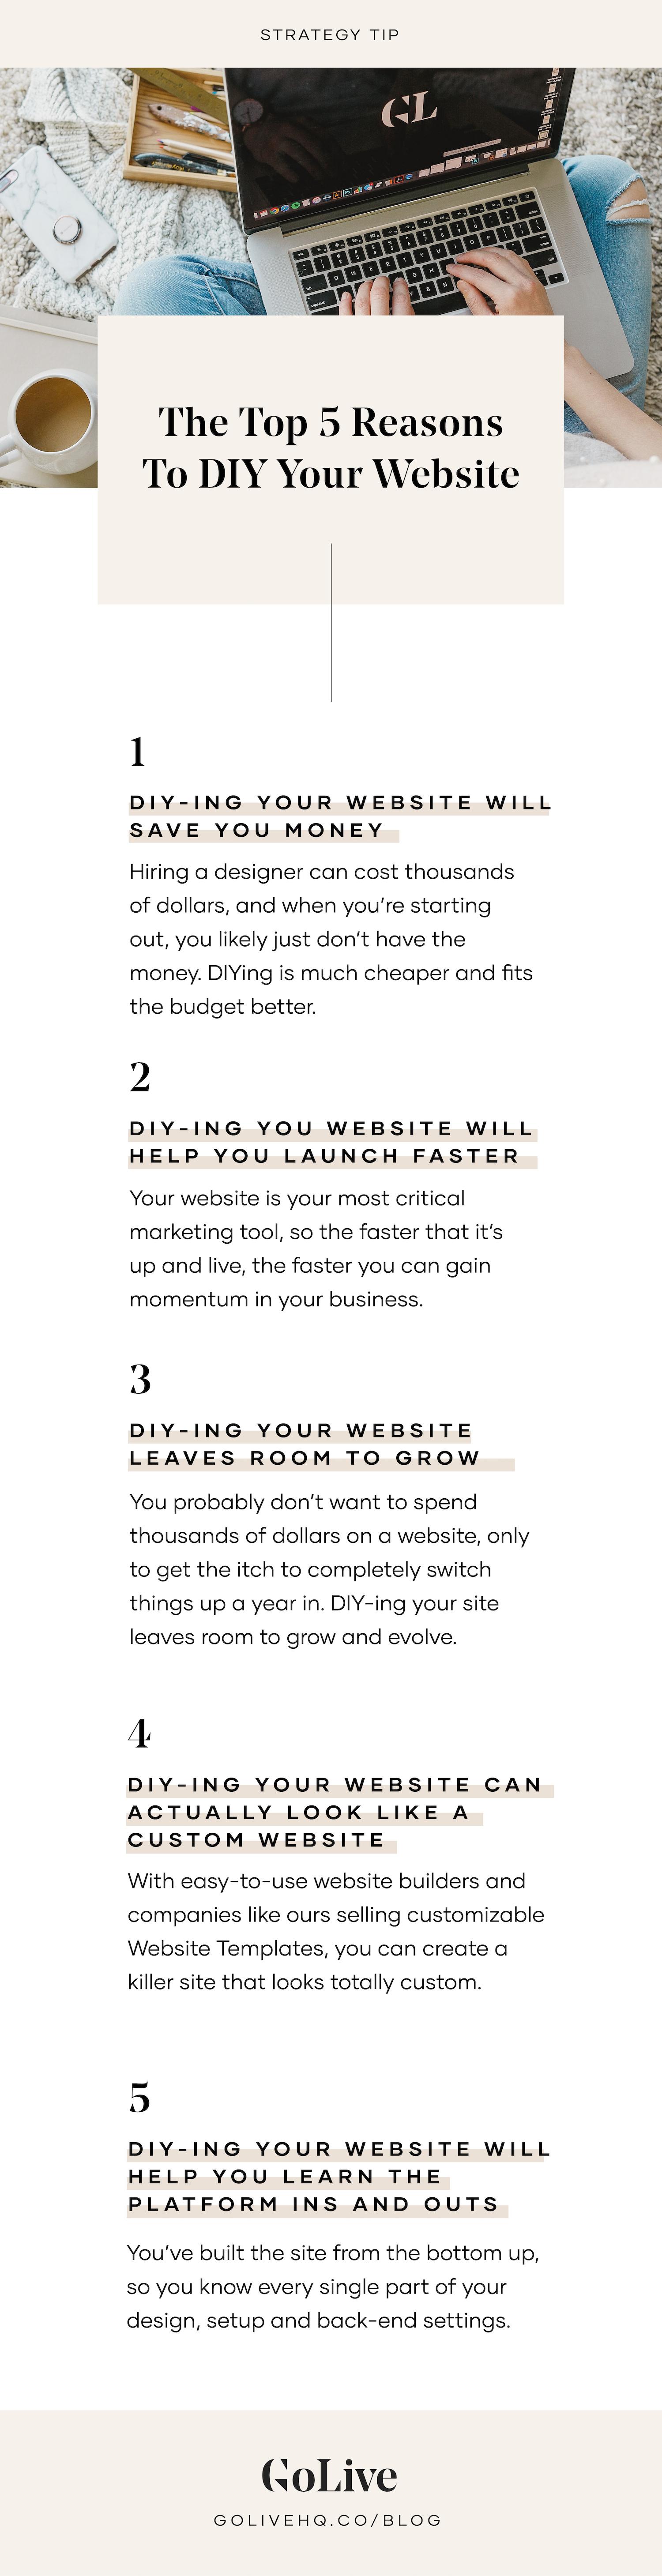 5 reasons to diy your website_Pinterest.jpg